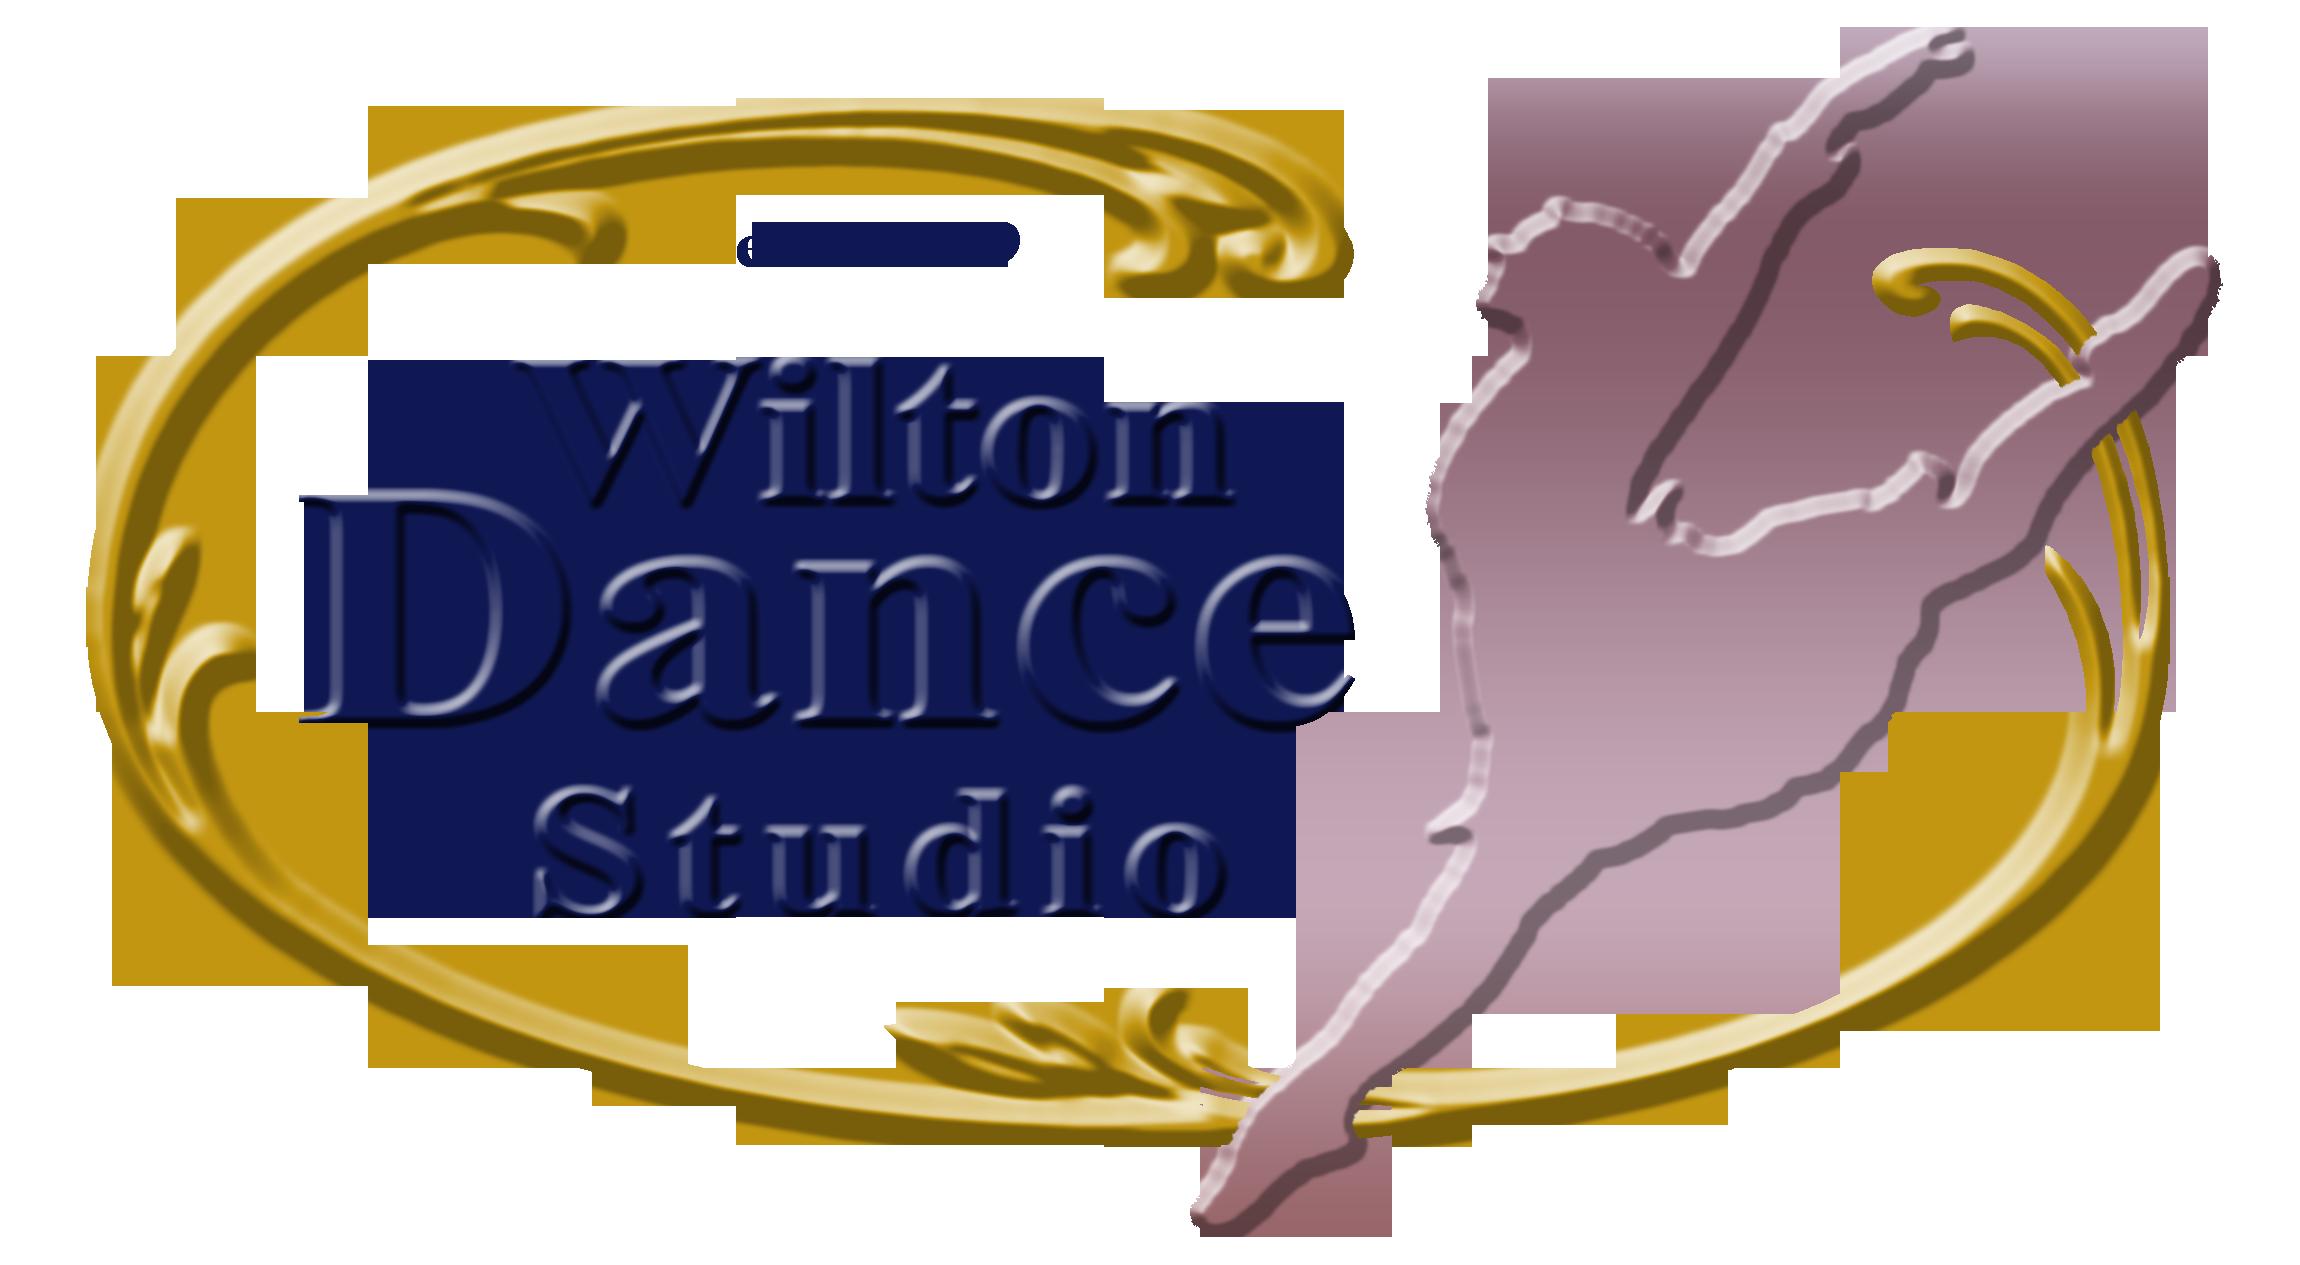 Wilton Dance Studio Inc.